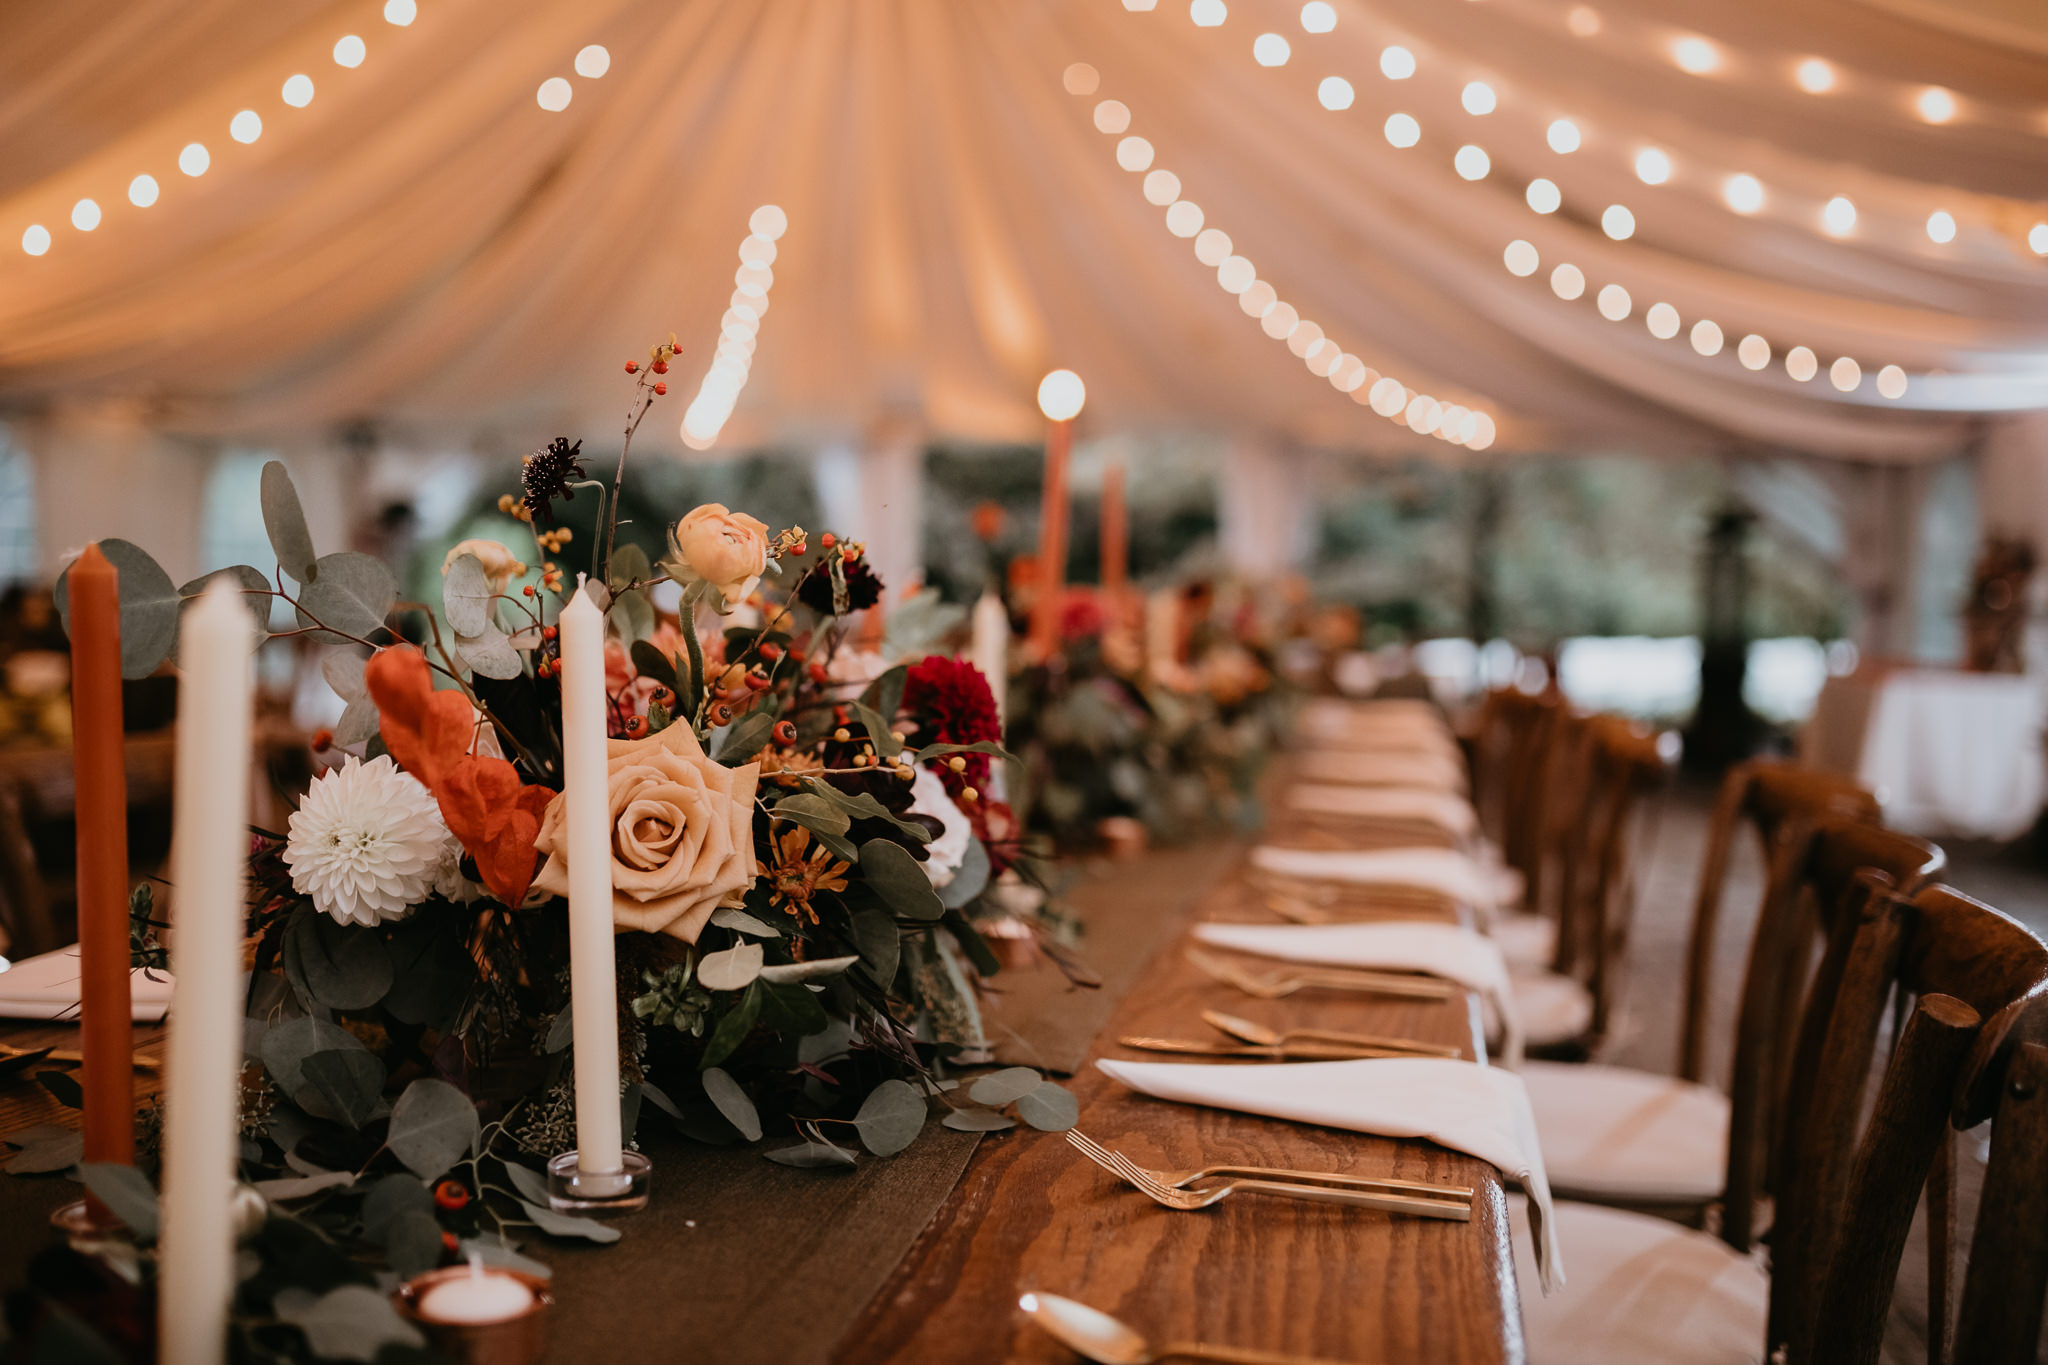 Sundara - Weddings - Best - Wedding Photographer - Virginia - Pat Cori Photography.jpg